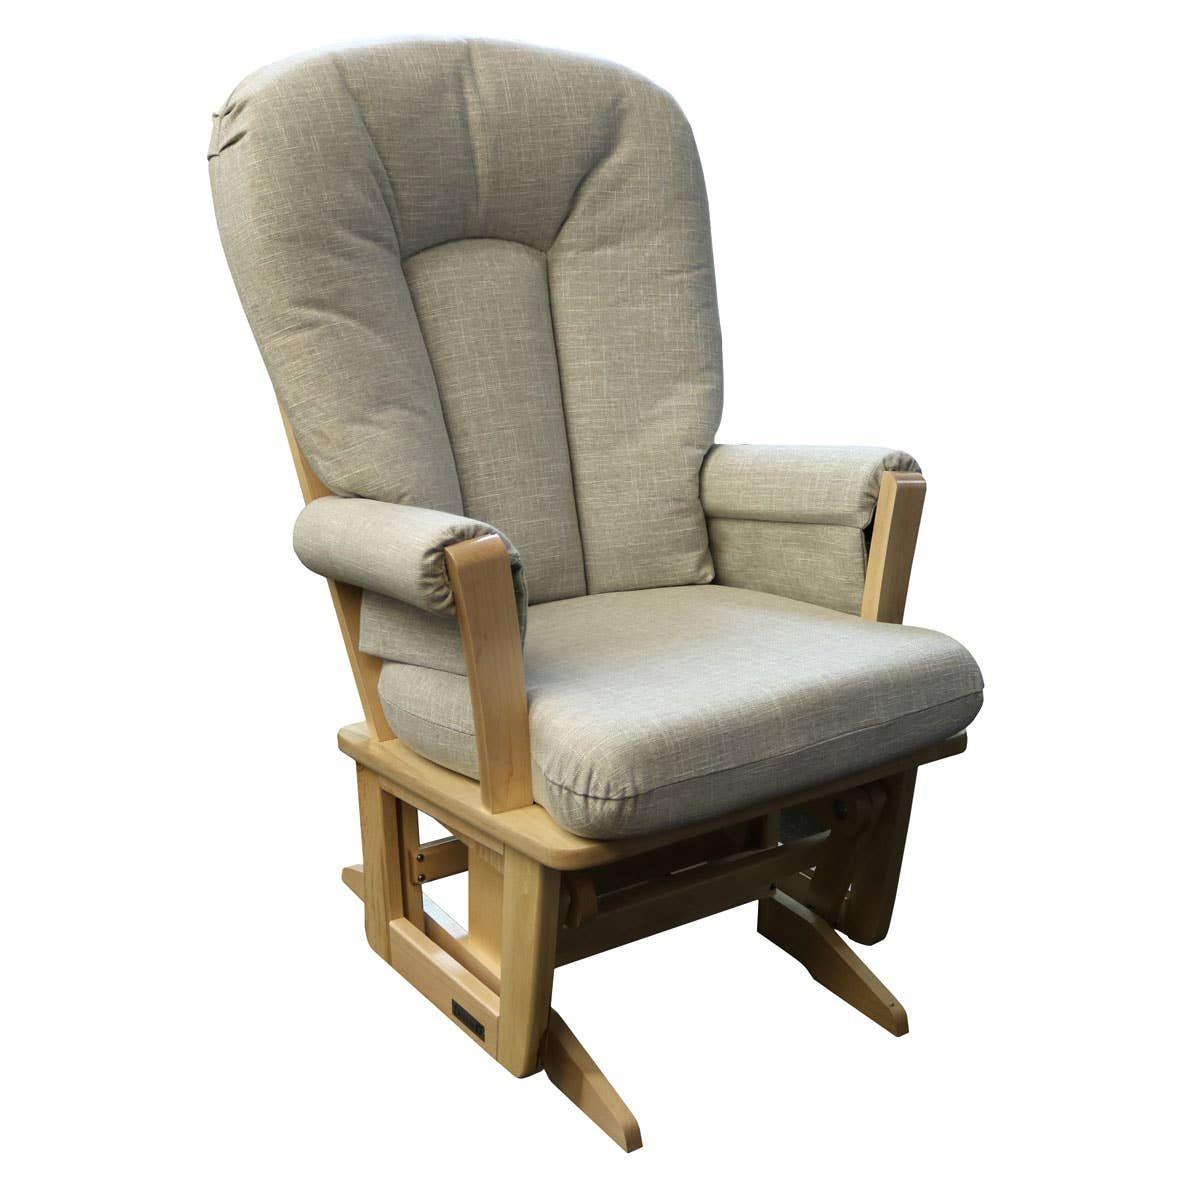 Chaise Bercante Exclusive Bois Naturel Tissu Gris Pale 5211 Dutailier Clement Nursery Glider Chair Modern Furniture Companies Recliner Chair